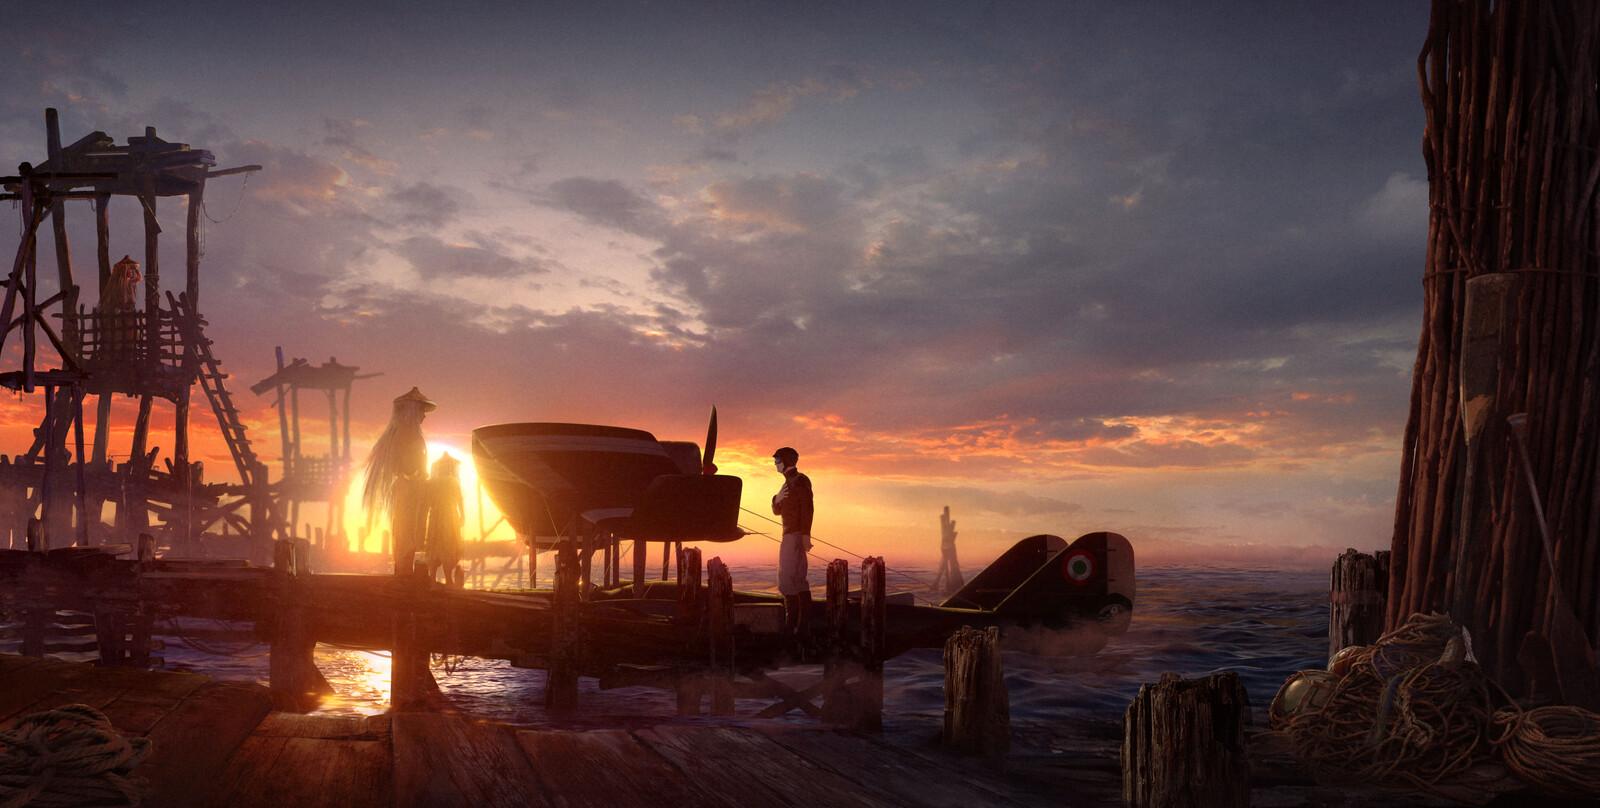 The fisherman village